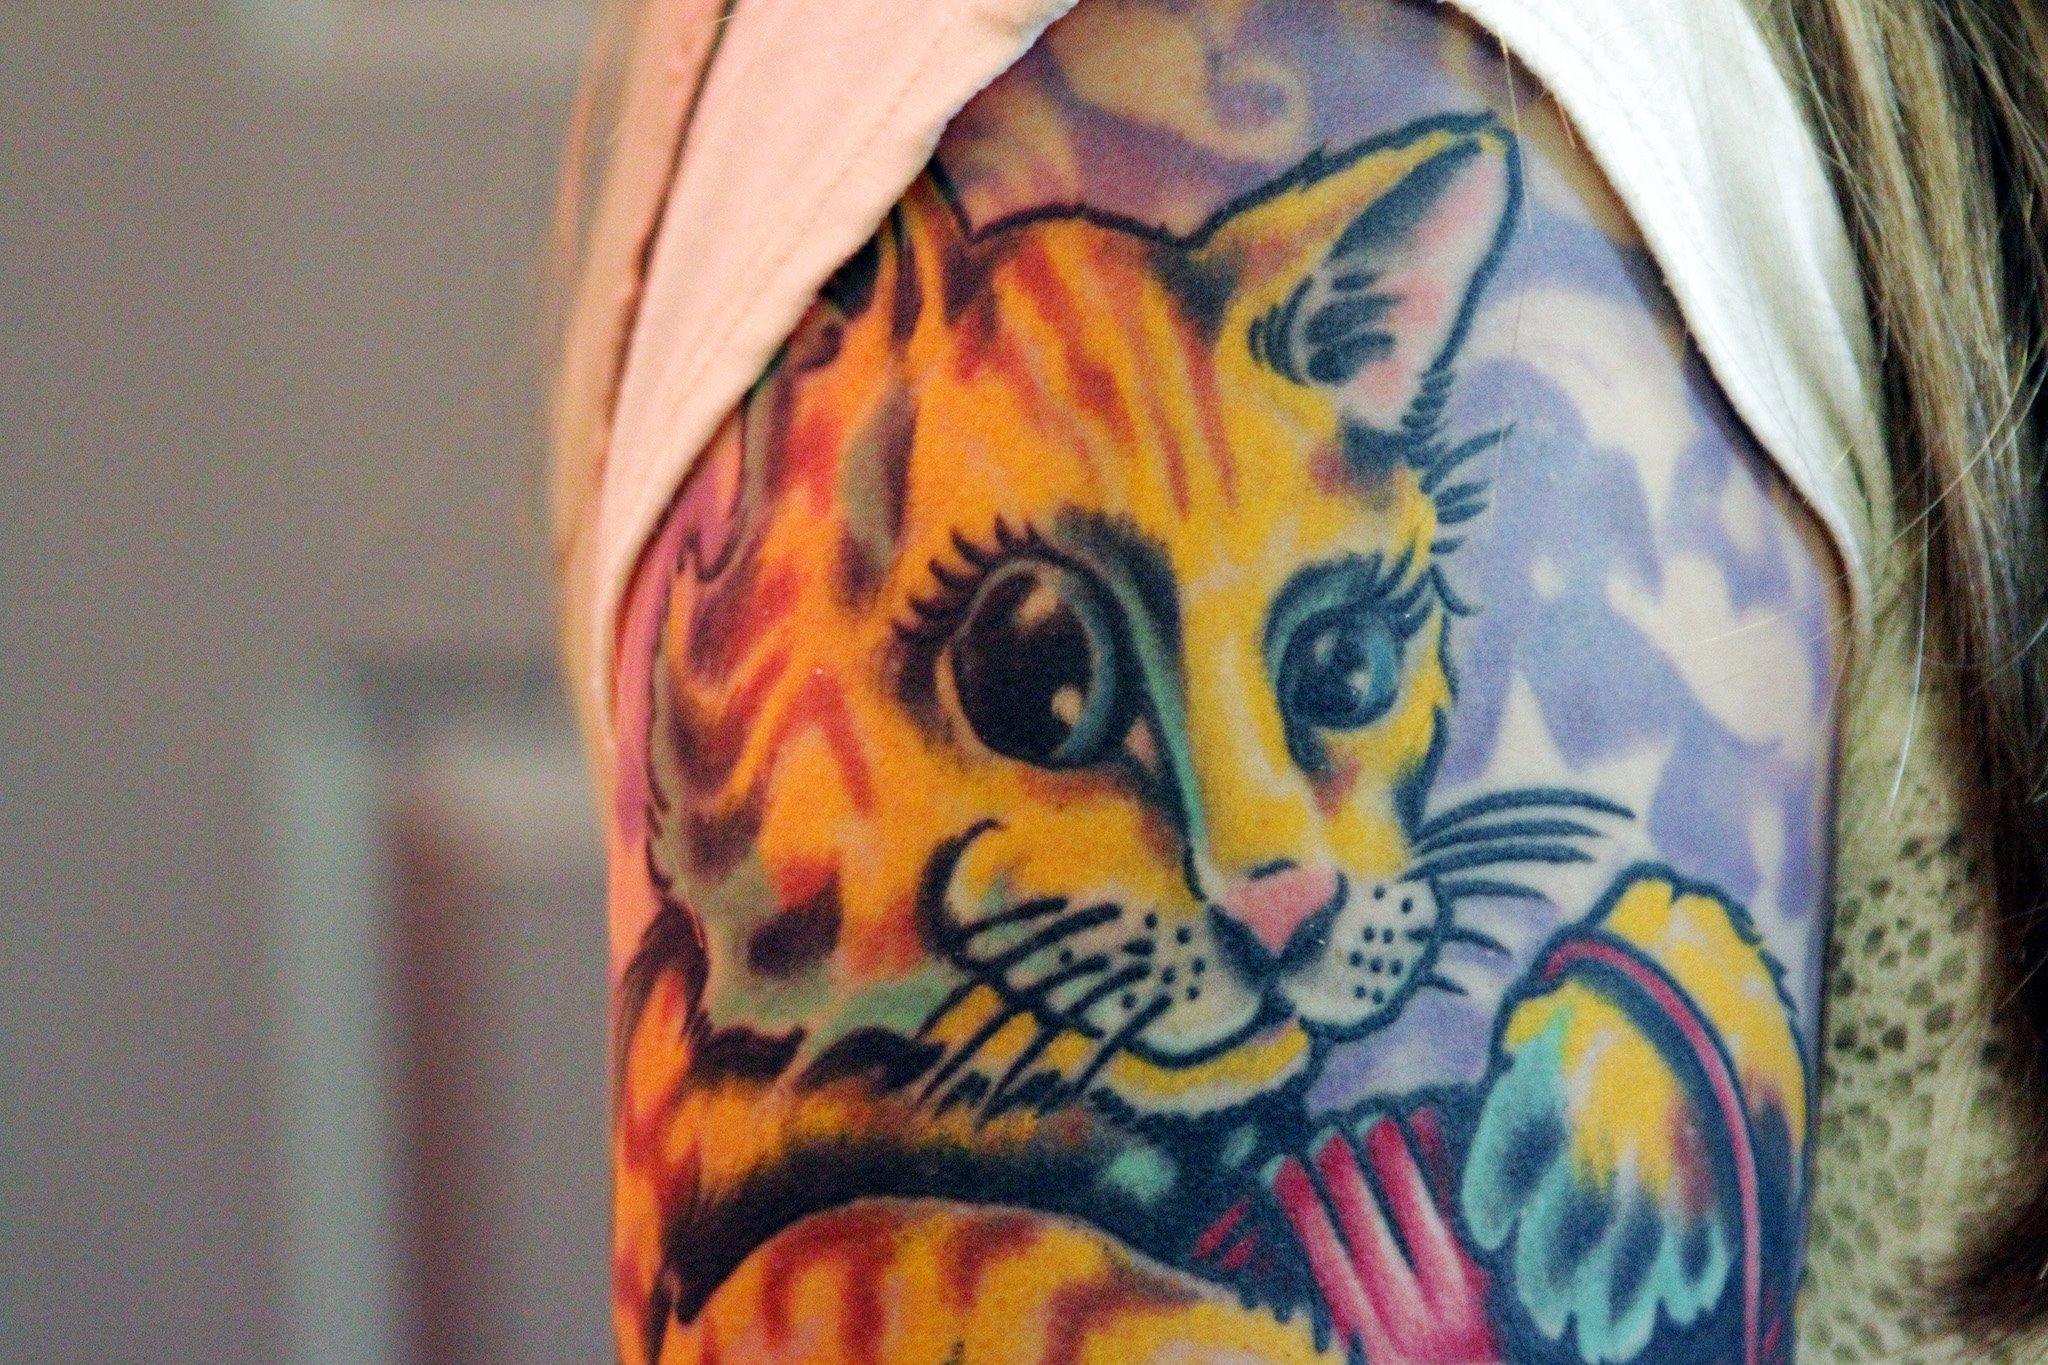 Victory Blvd Tattoo_AMP_072213_022.jpg